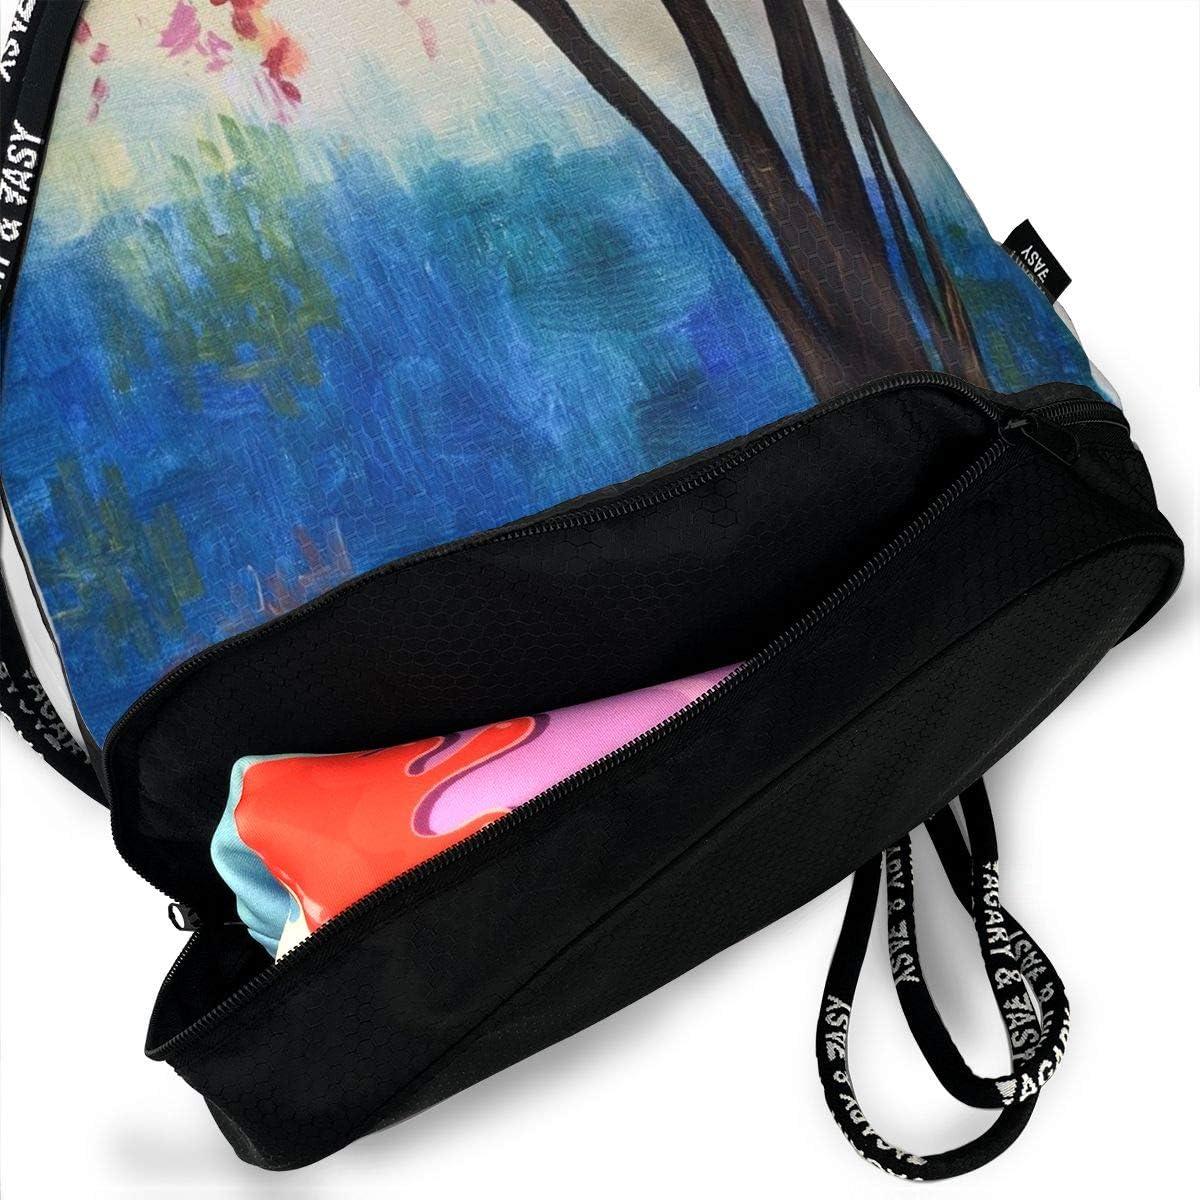 Drawstring Backpack Radiant-branches Bags Knapsack For Hiking